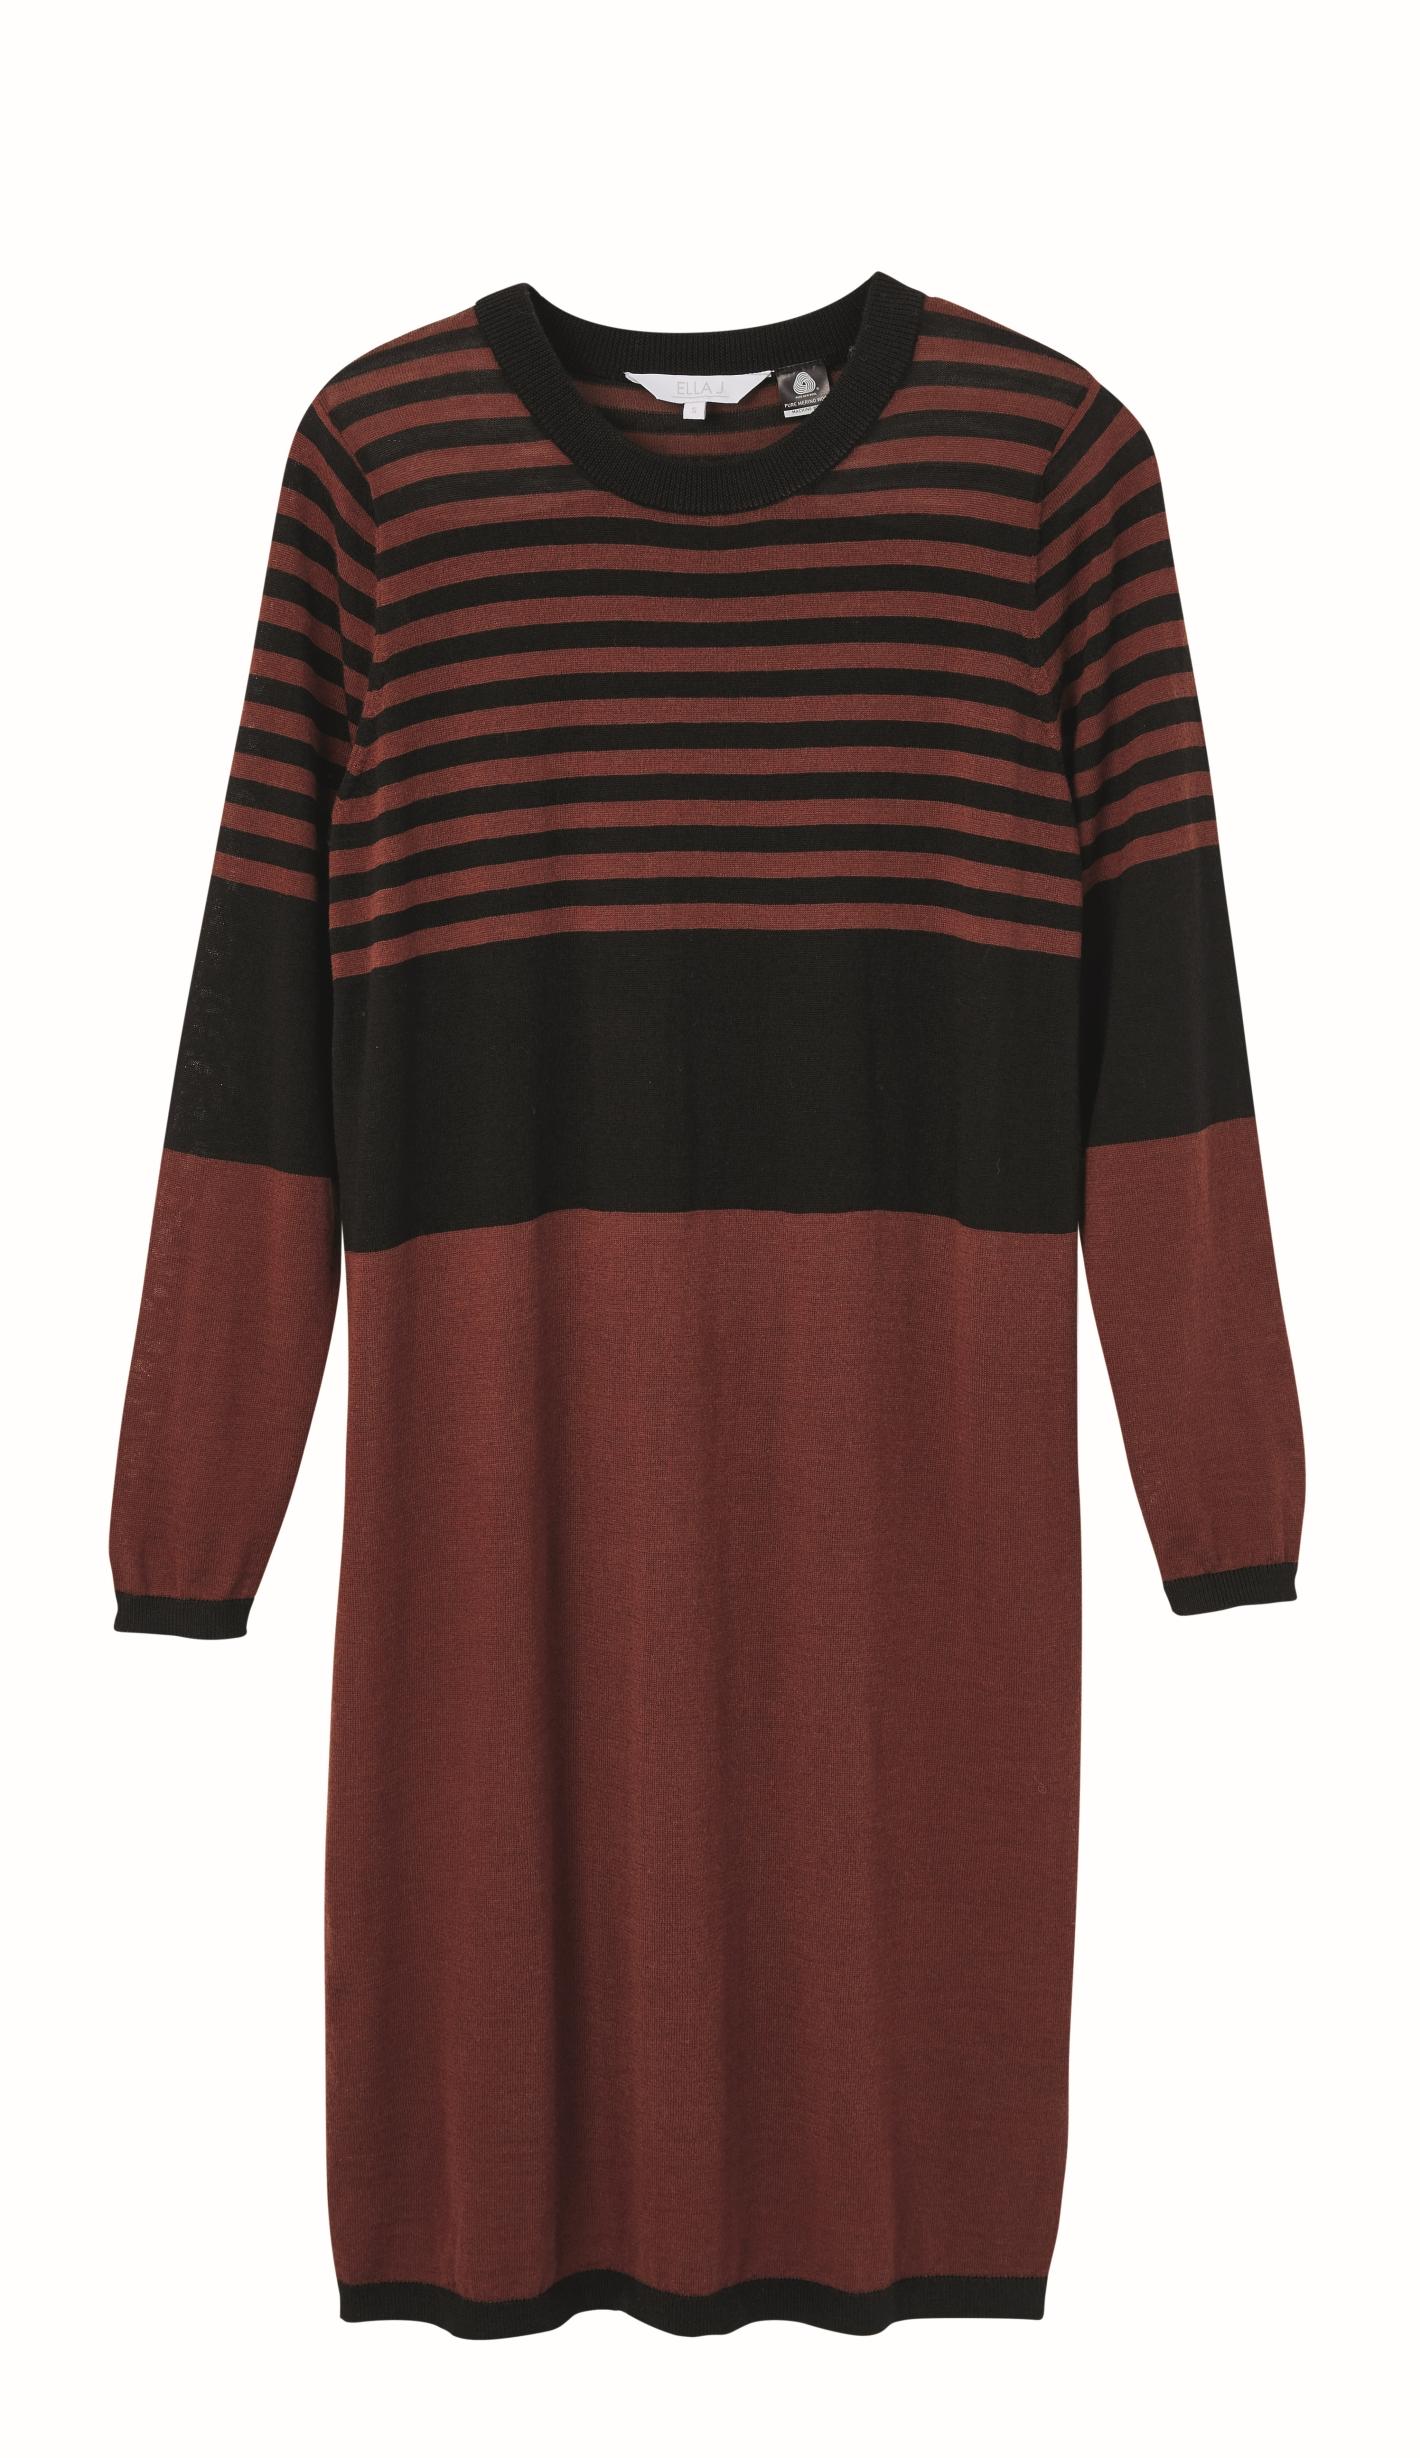 Ella J Verigated Stripe Merino Dress $109.99